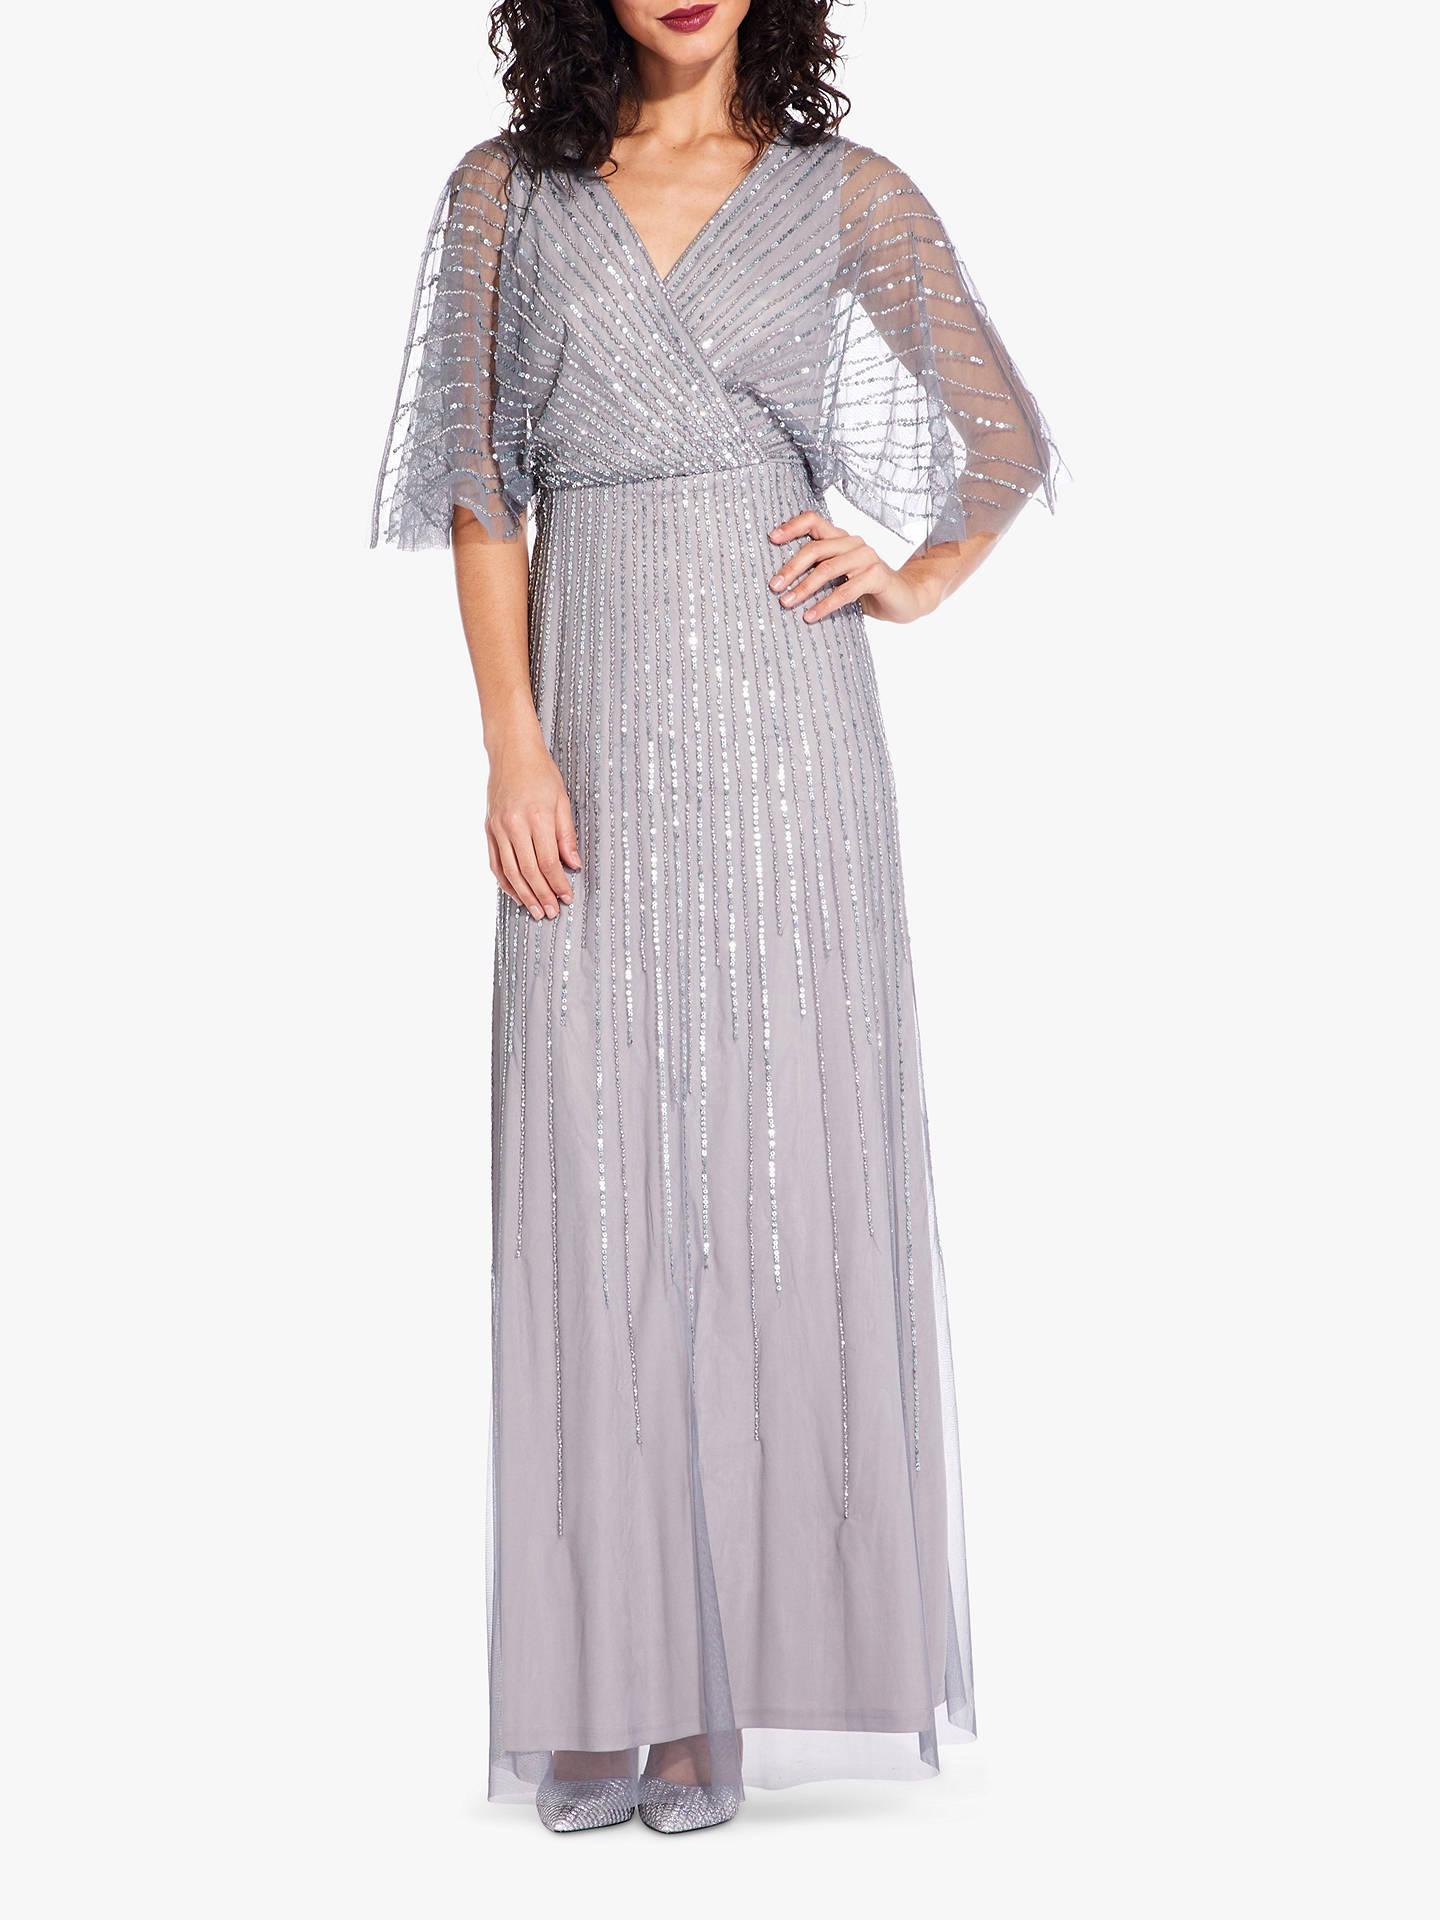 2fbb6a77a43 Adrianna Papell Mesh Sleeve Dress